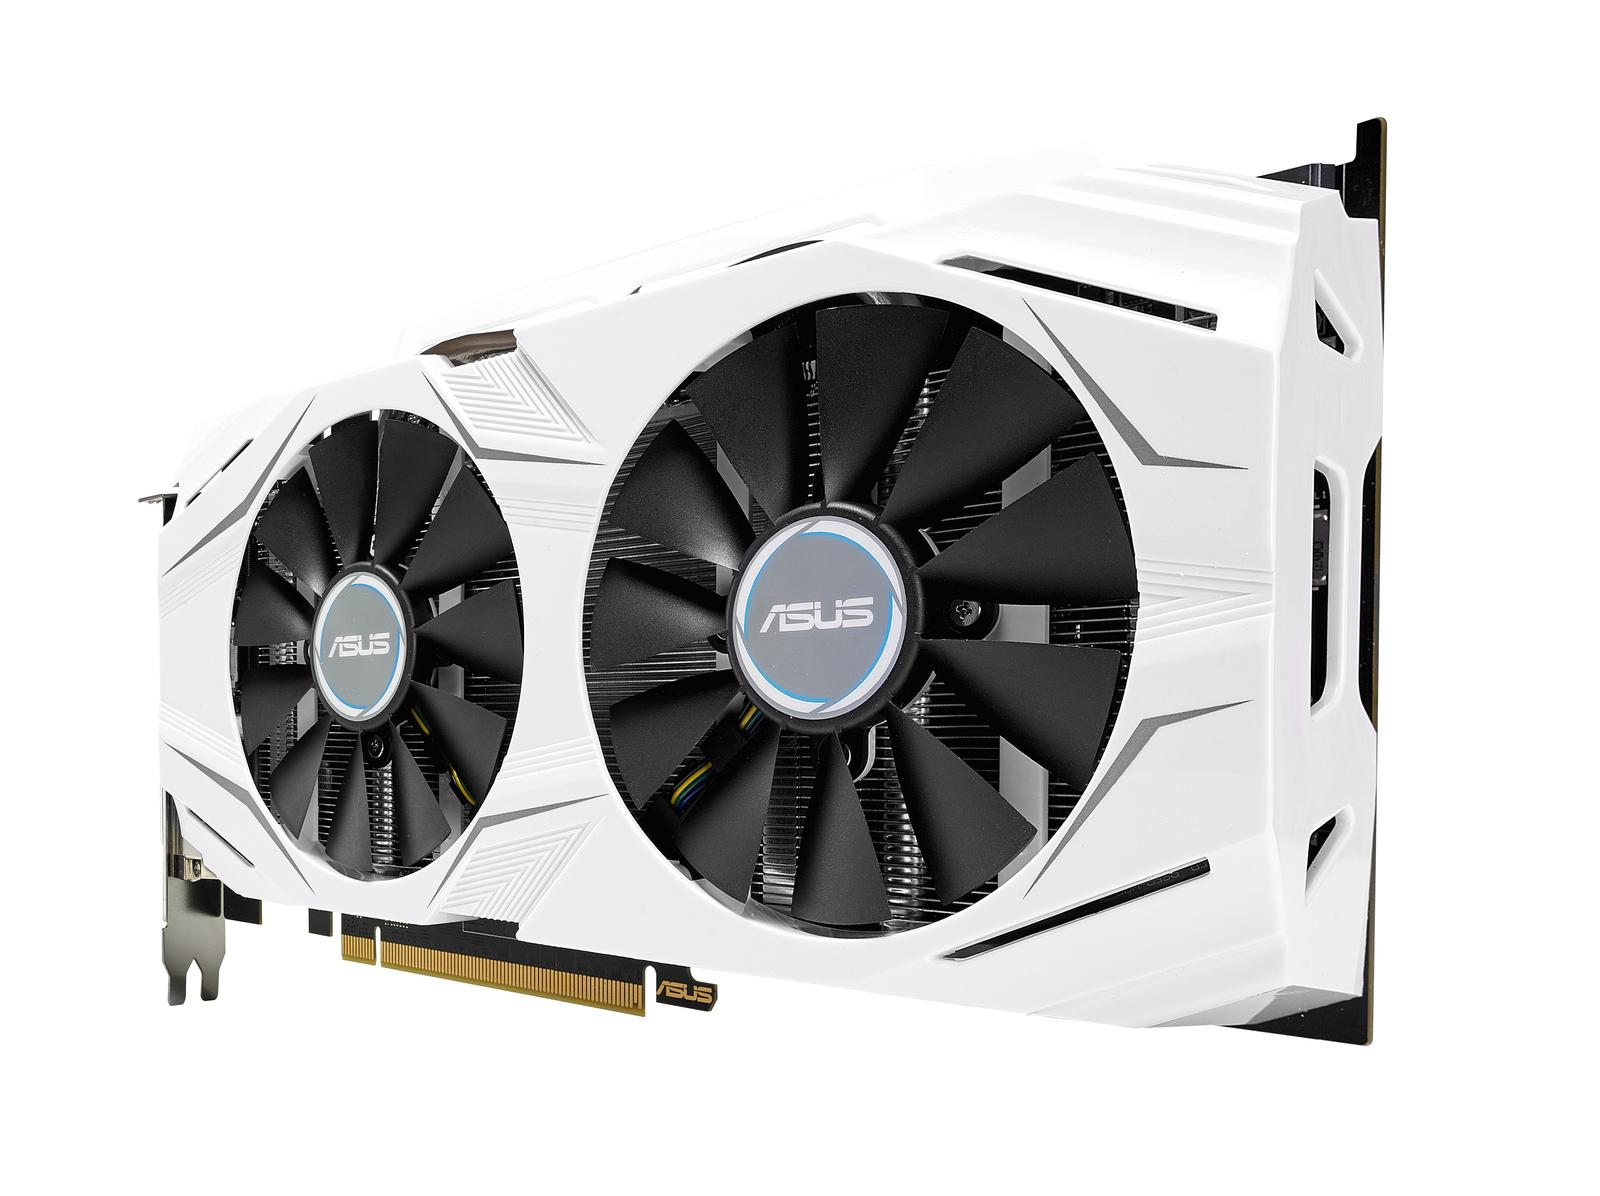 Asus GeForce GTX 1060 6GB 6 GB DUAL Video Card